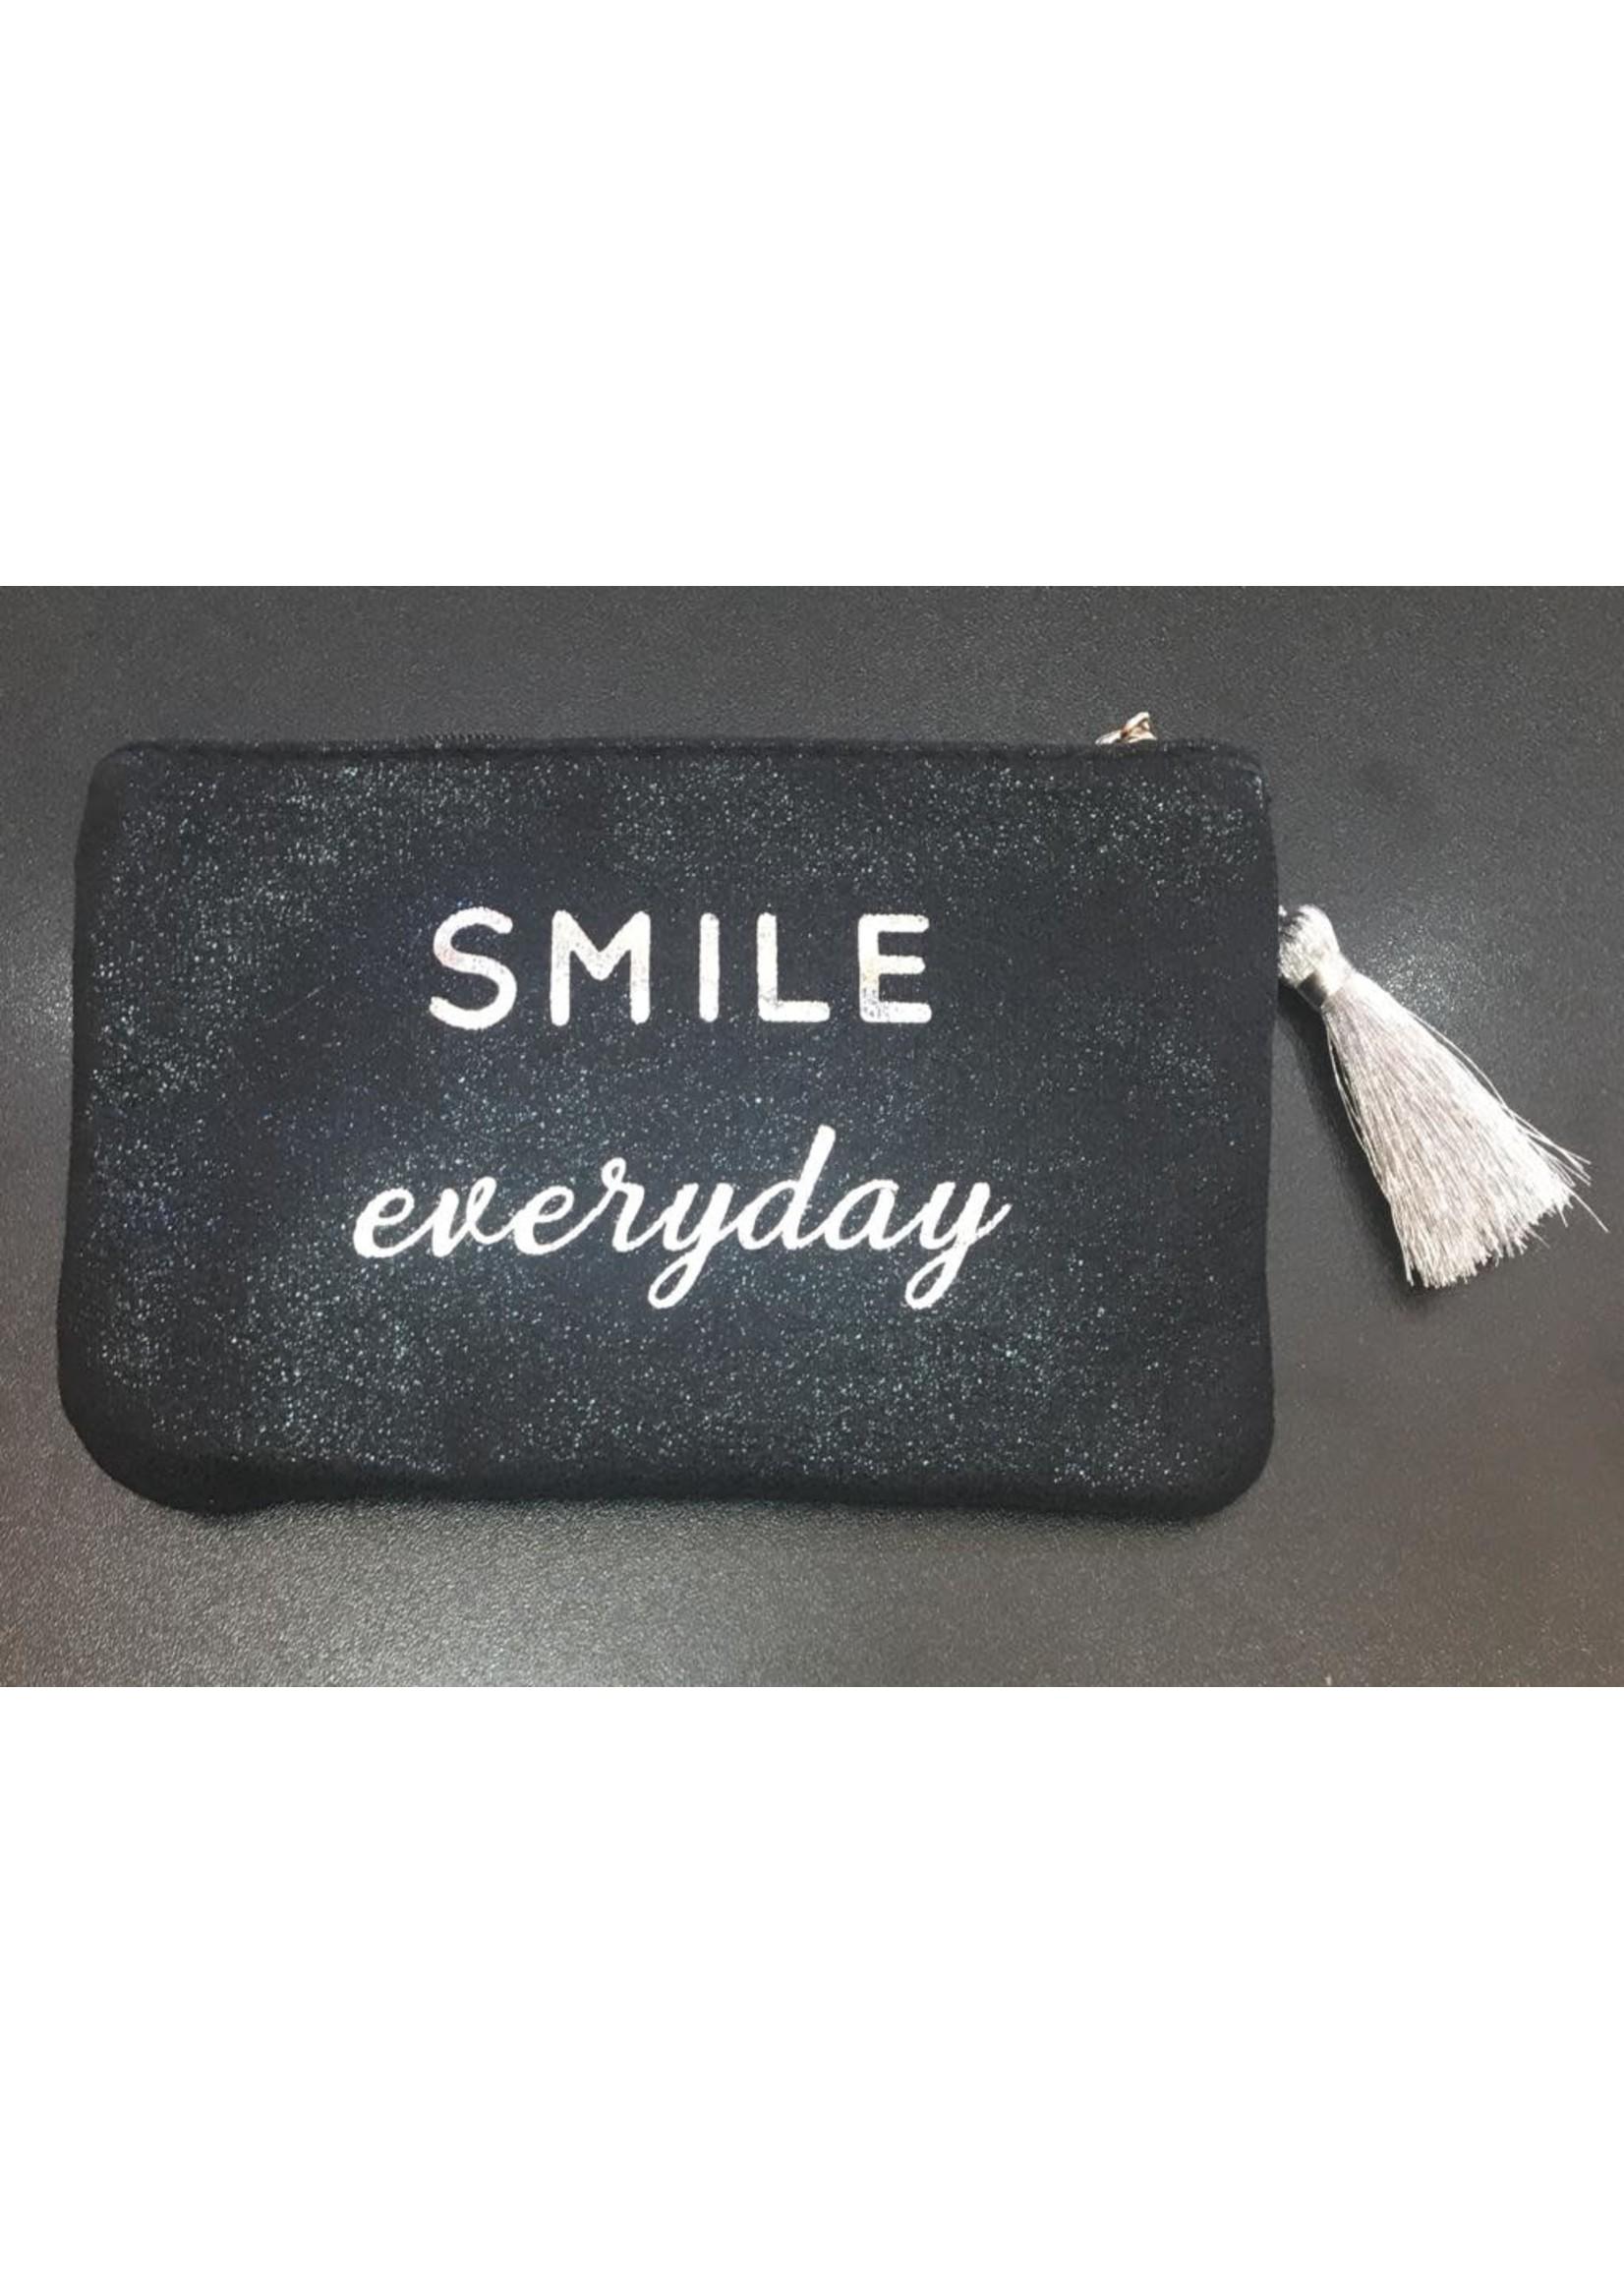 Smile everyday glitter purse